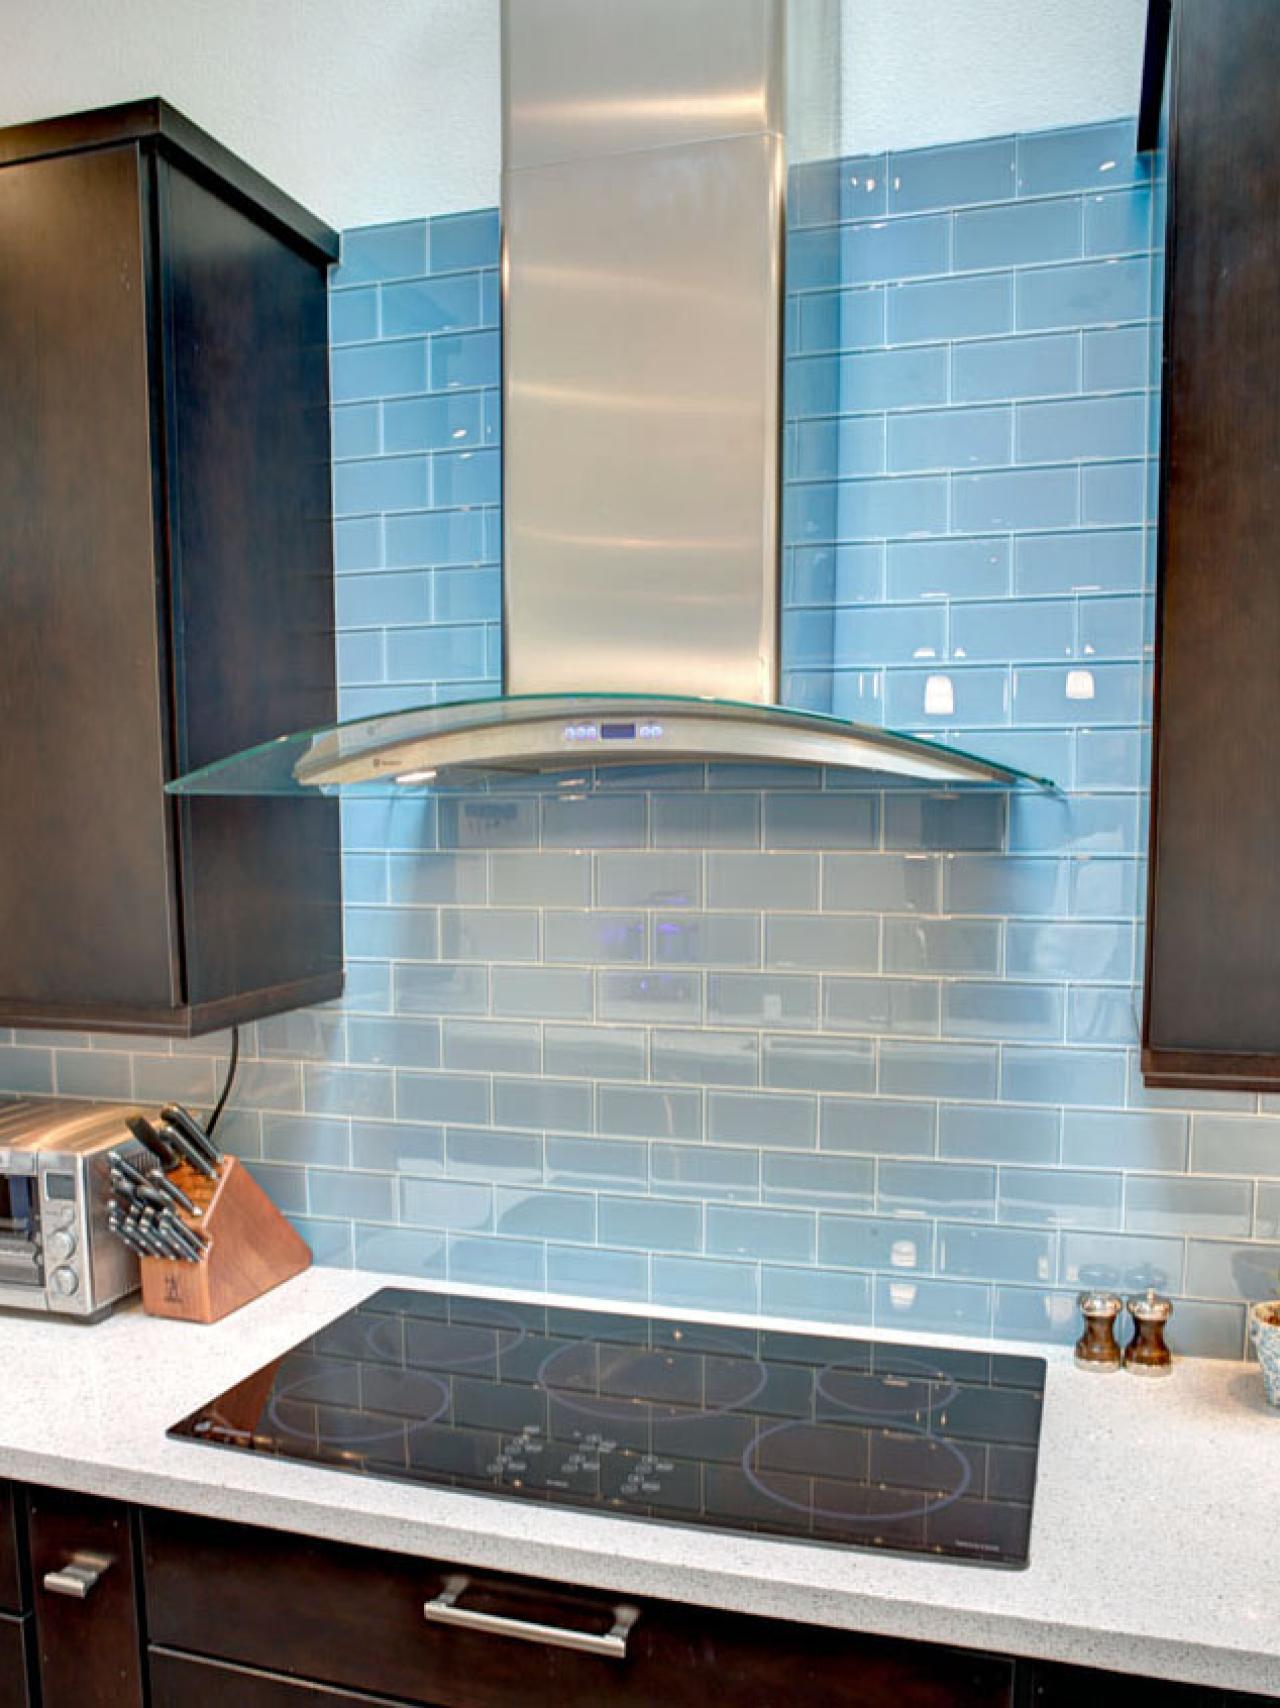 Modern Blue Tile Backsplash and Hood | HGTV